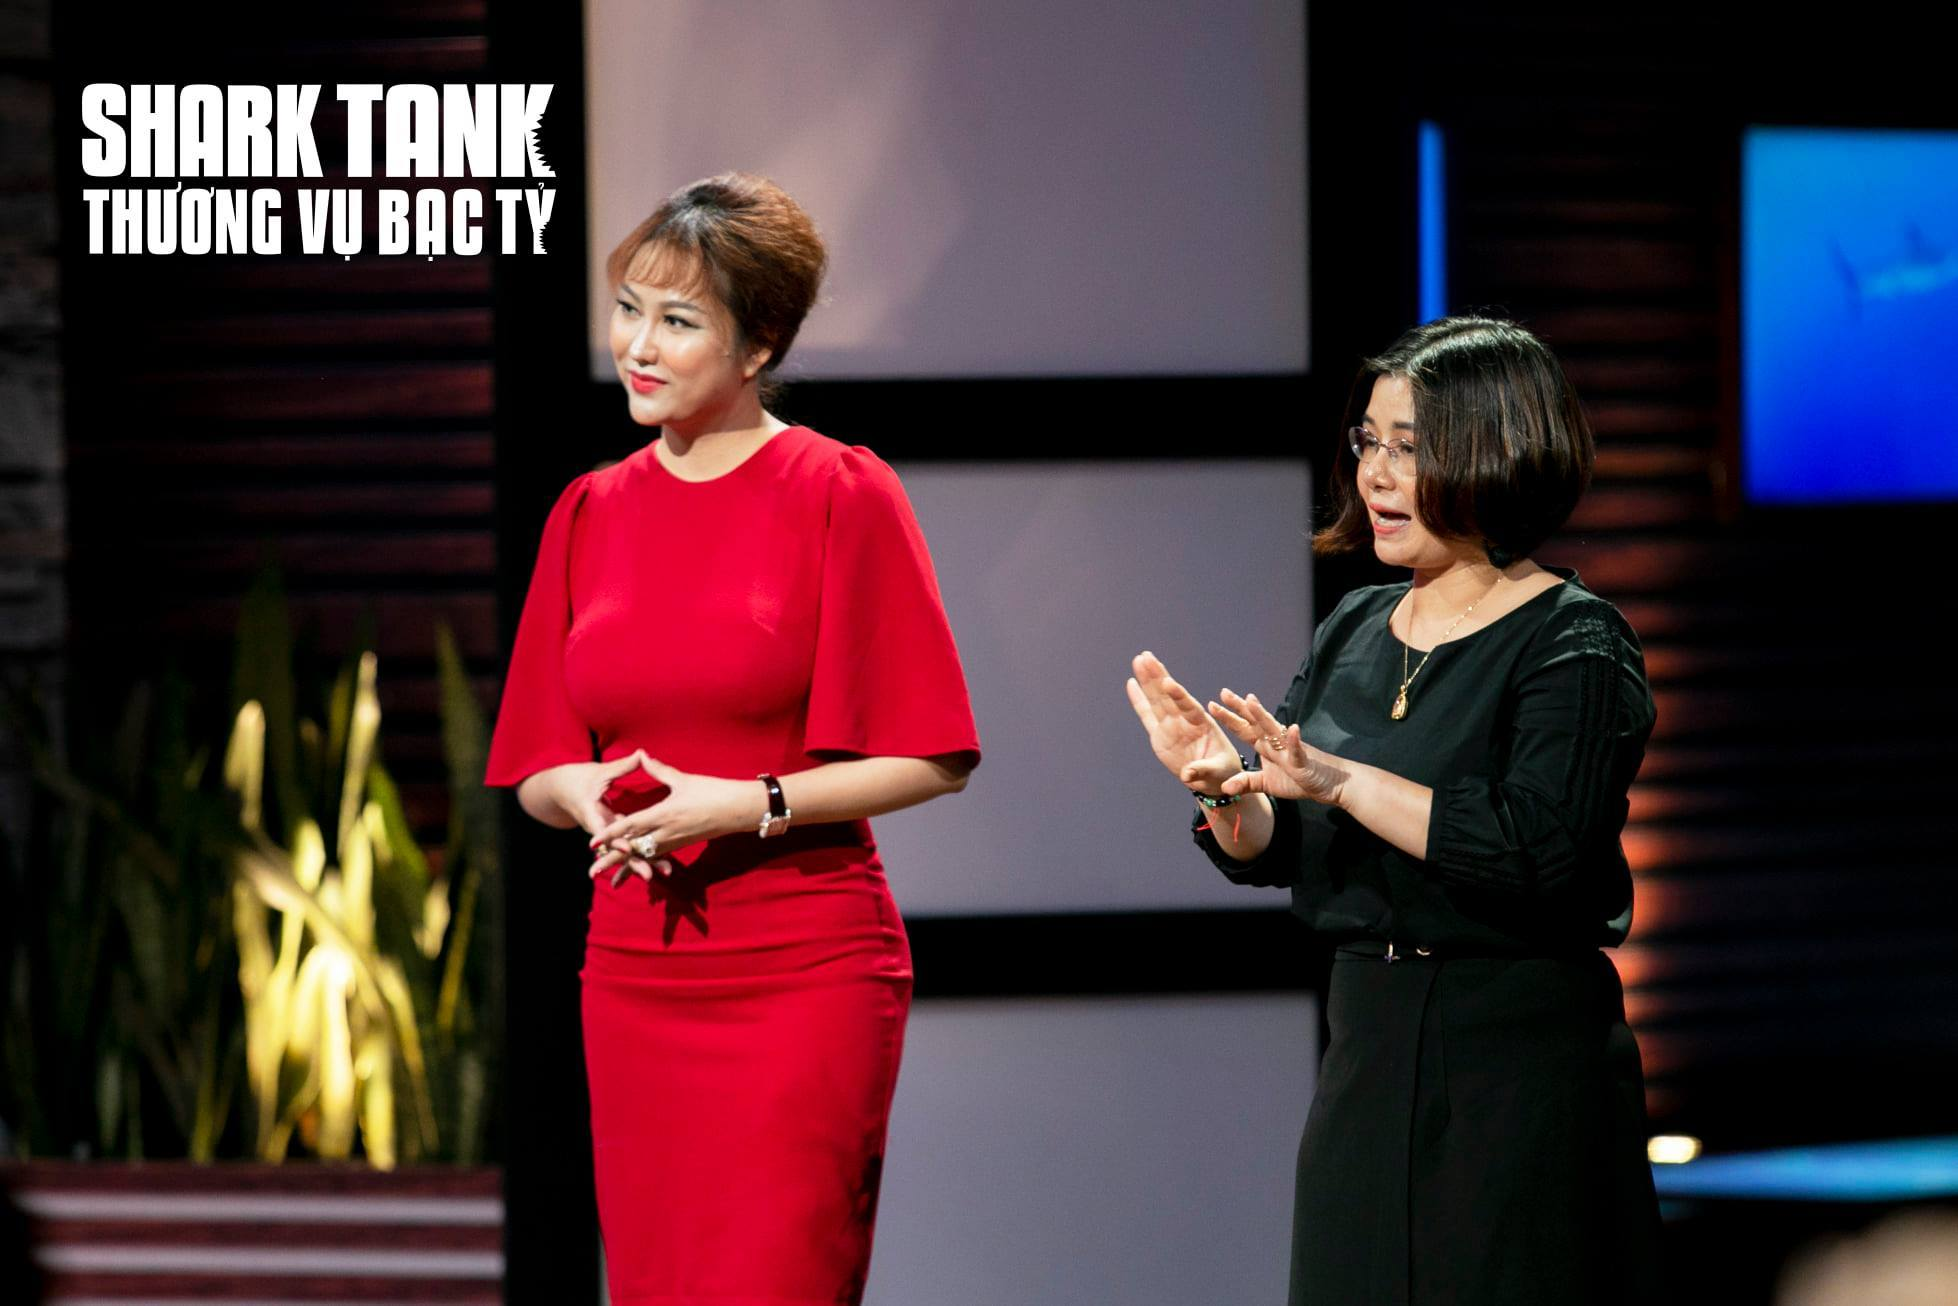 Phi Thanh Vân,Shark Tank Vietnam